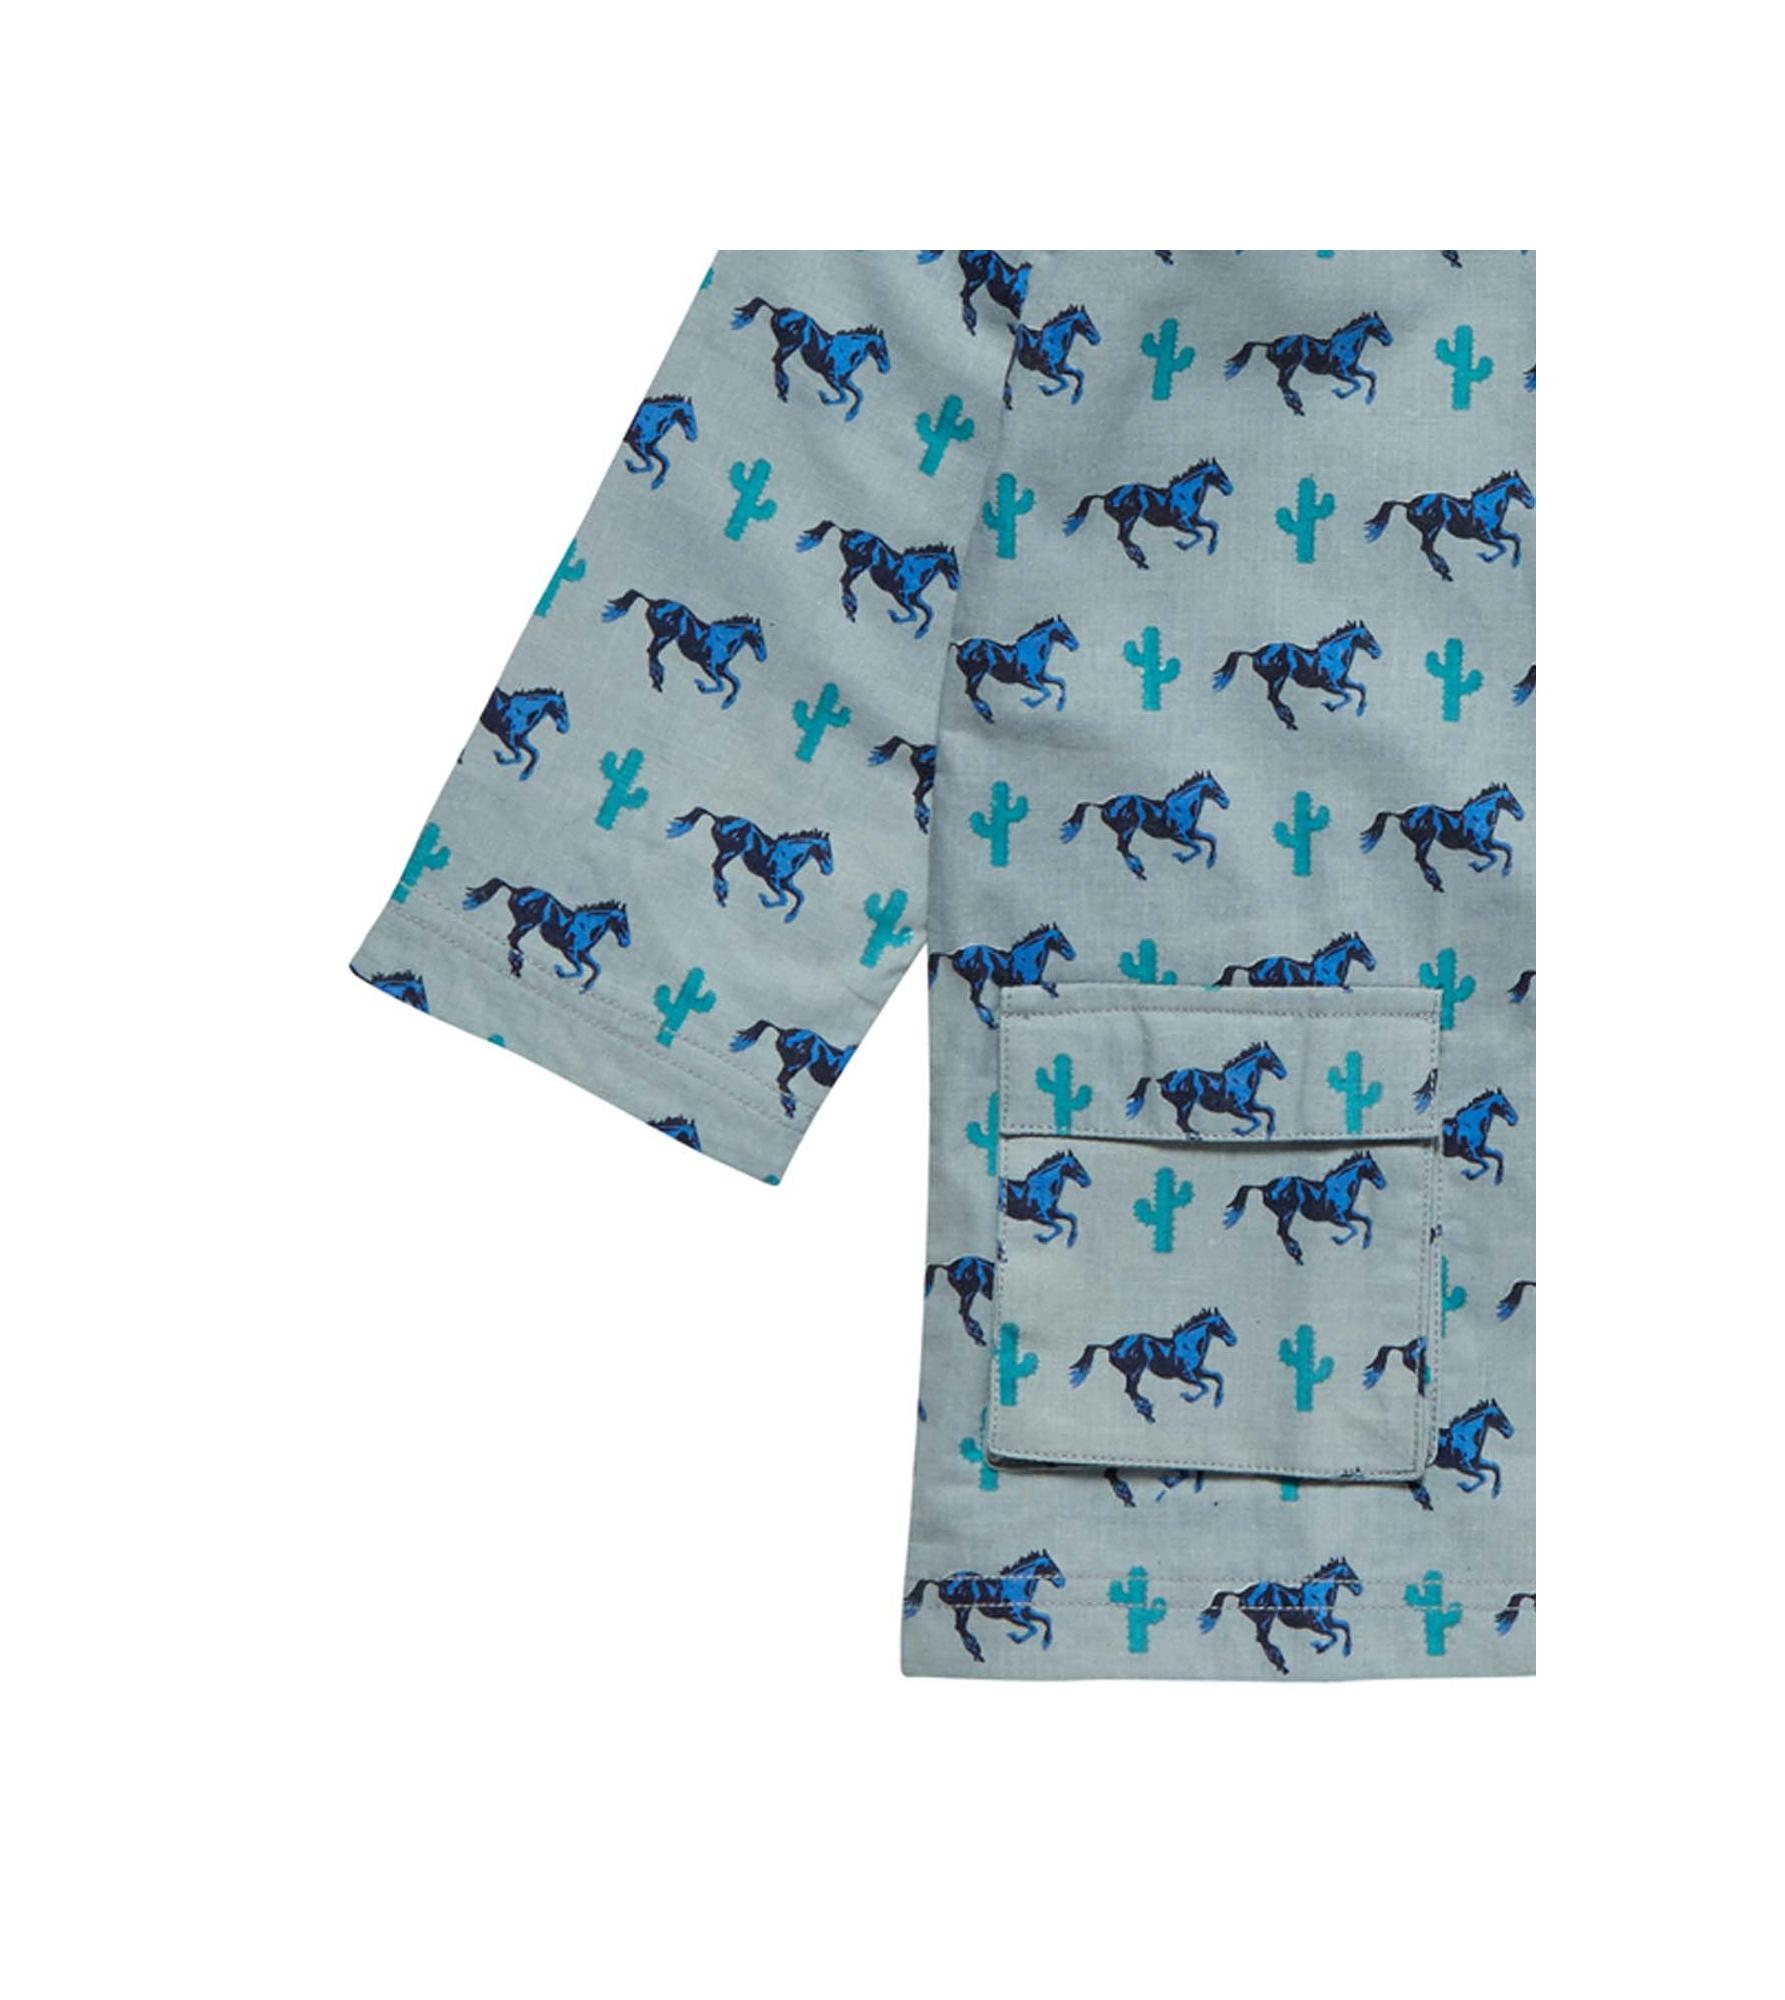 1711547-sense-organics-Lou-jacket-horse-print-detail-3.jpg